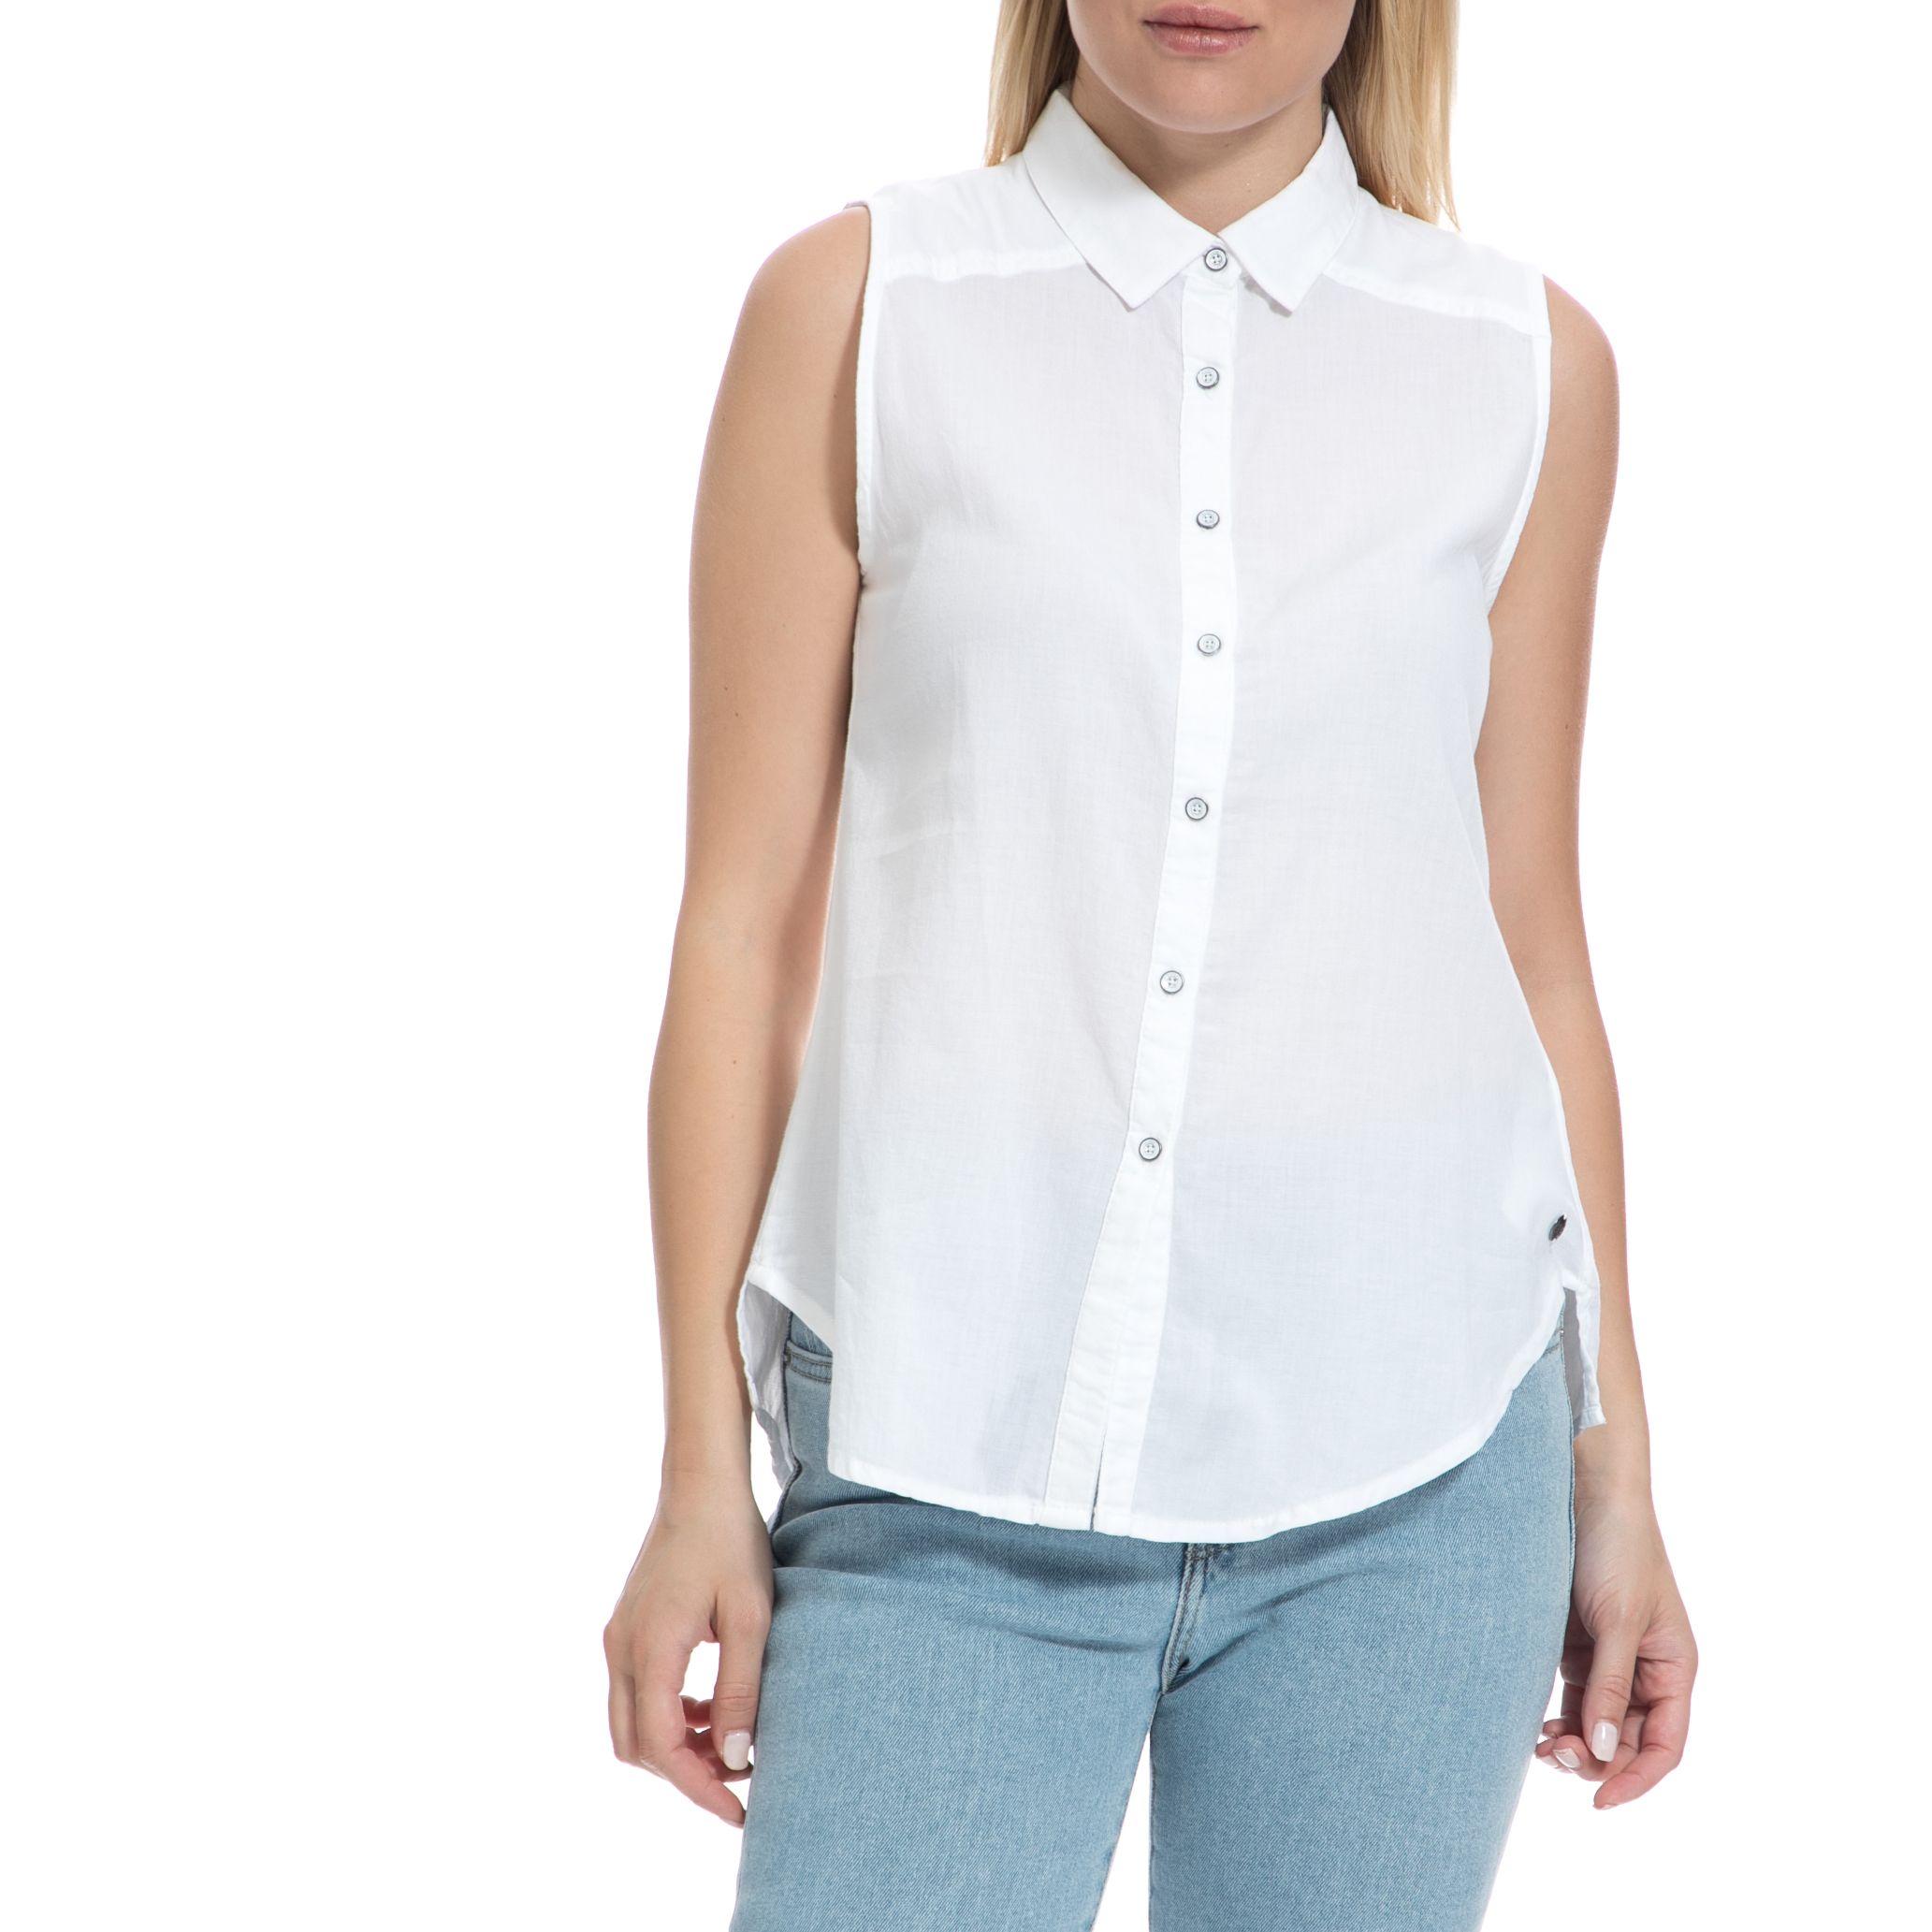 GARCIA JEANS - Γυναικείο πουκάμισο GARCIA JEANS λευκό γυναικεία ρούχα πουκάμισα κοντομάνικα αμάνικα